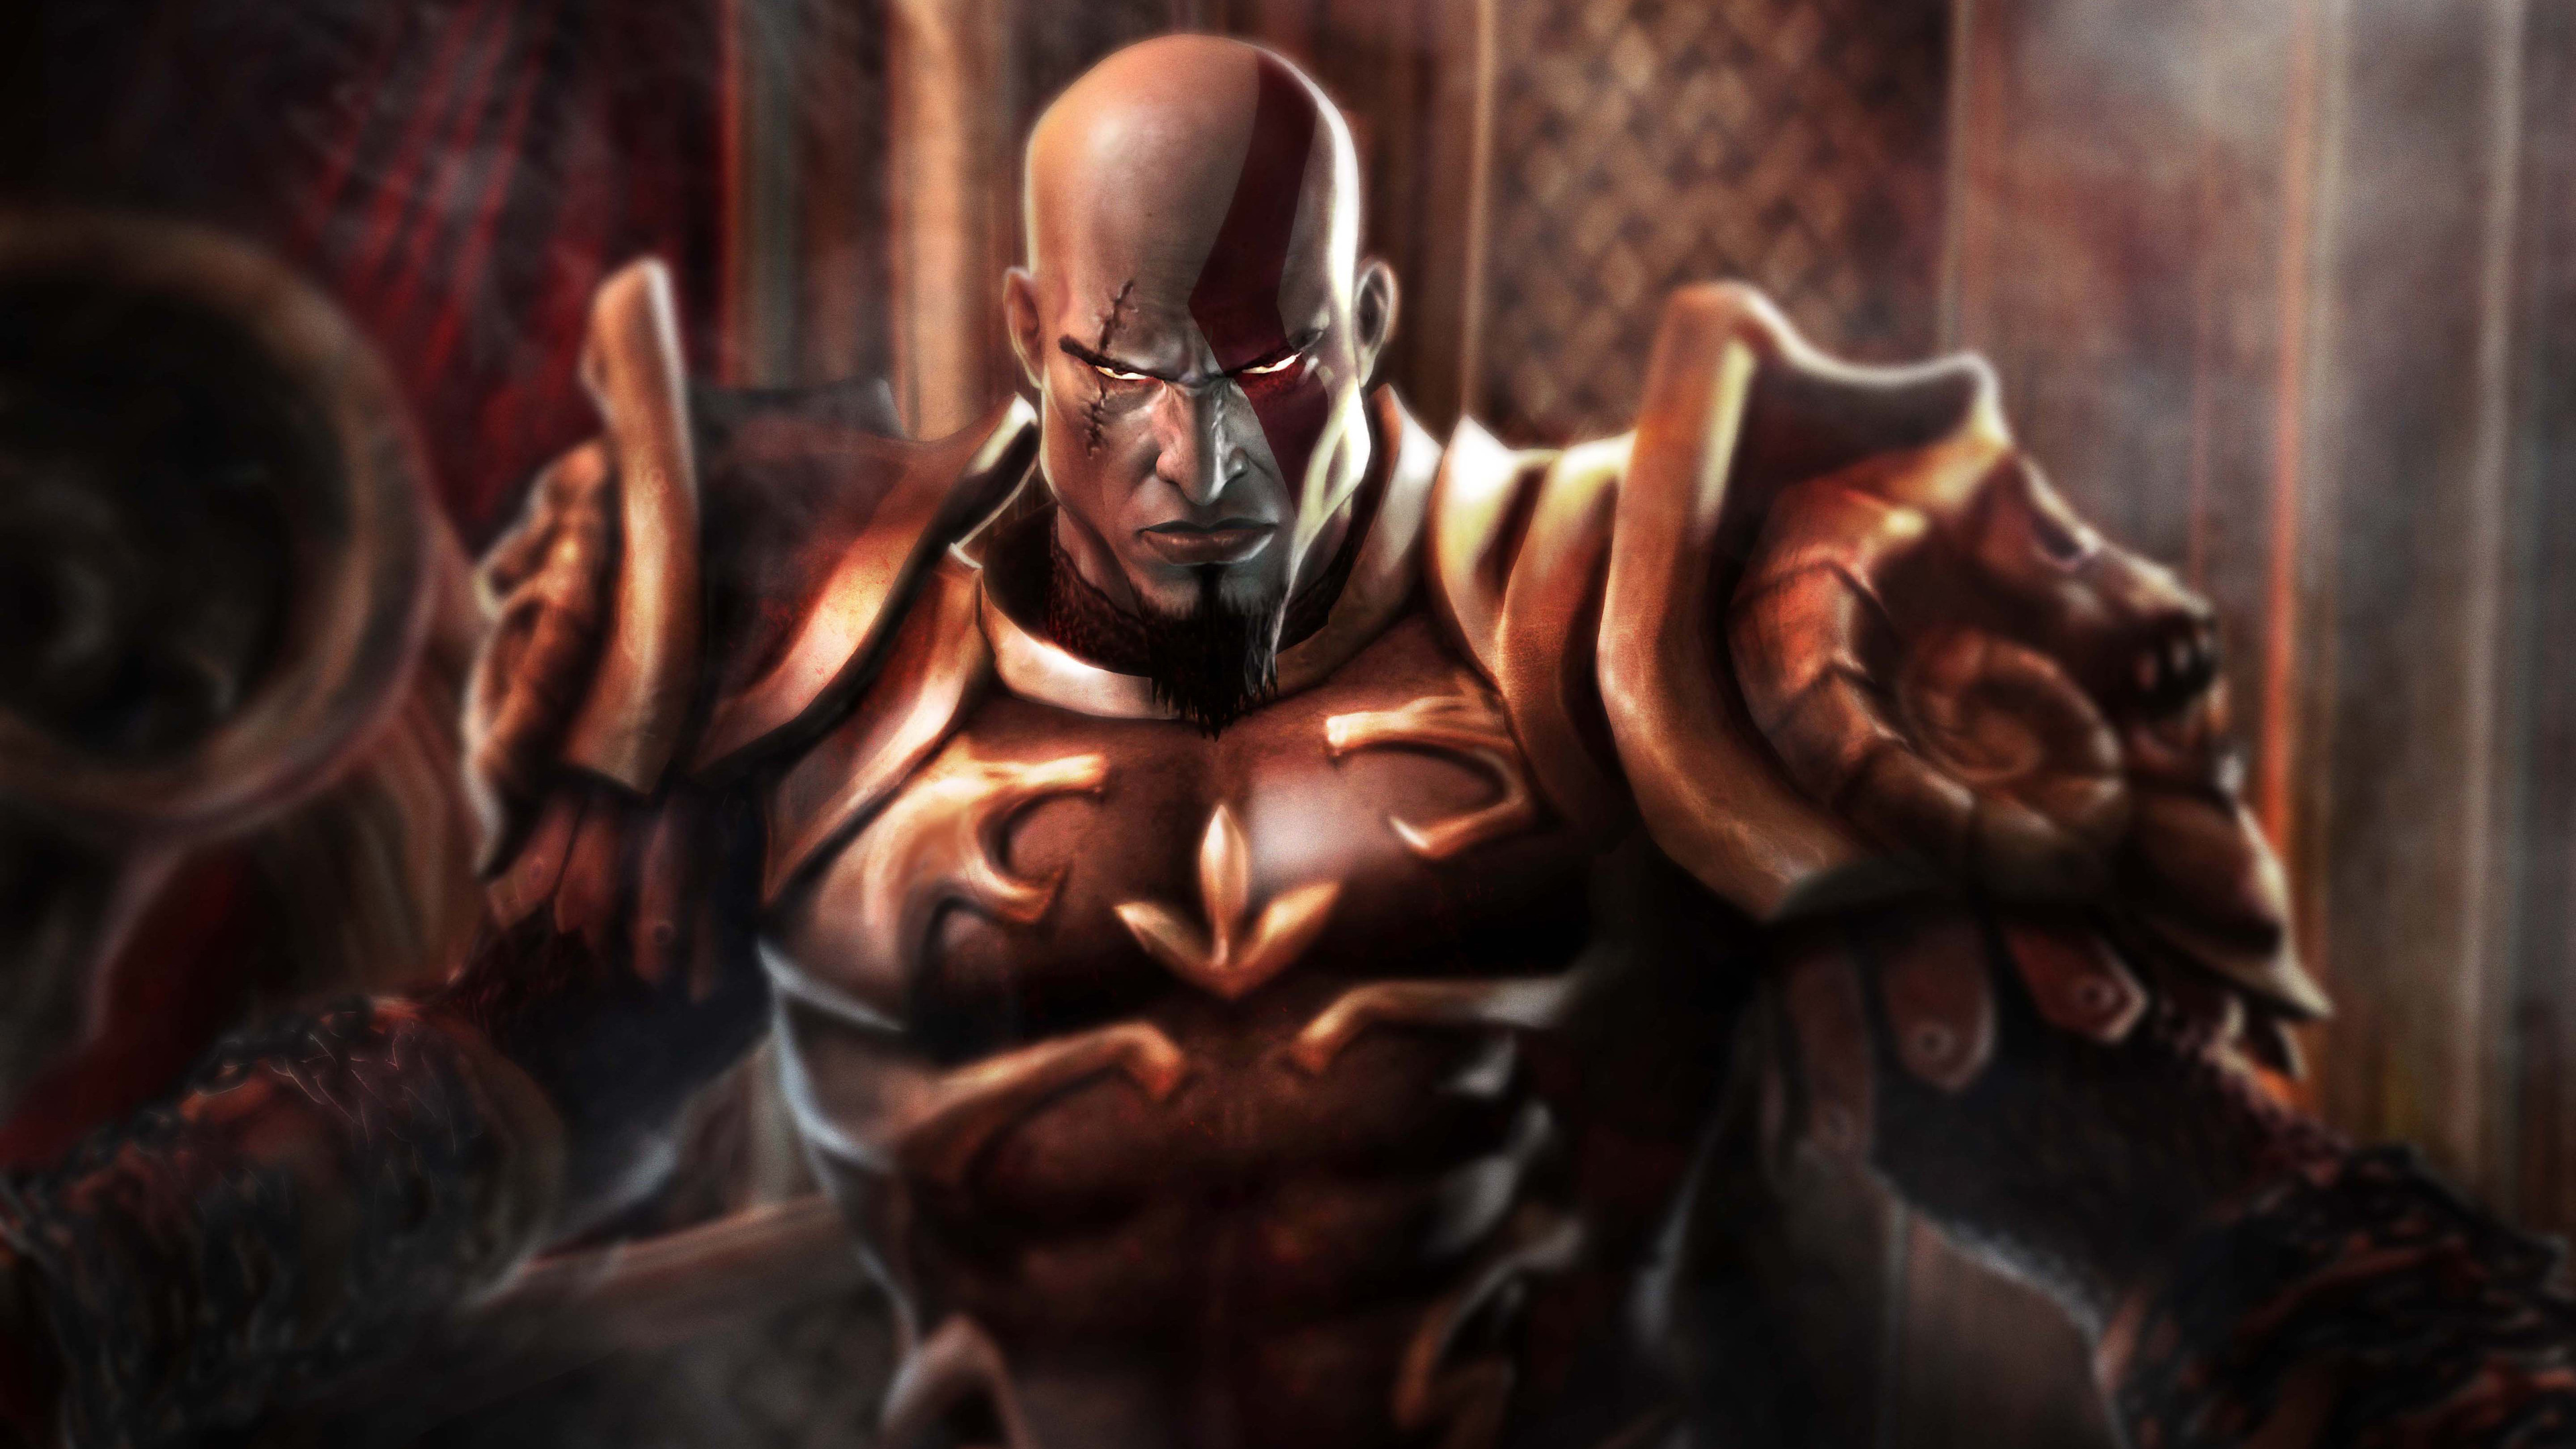 kratos in god of war 5k 1537691851 - Kratos In God Of War 5k - ps games wallpapers, kratos wallpapers, hd-wallpapers, god of war wallpapers, games wallpapers, 5k wallpapers, 4k-wallpapers